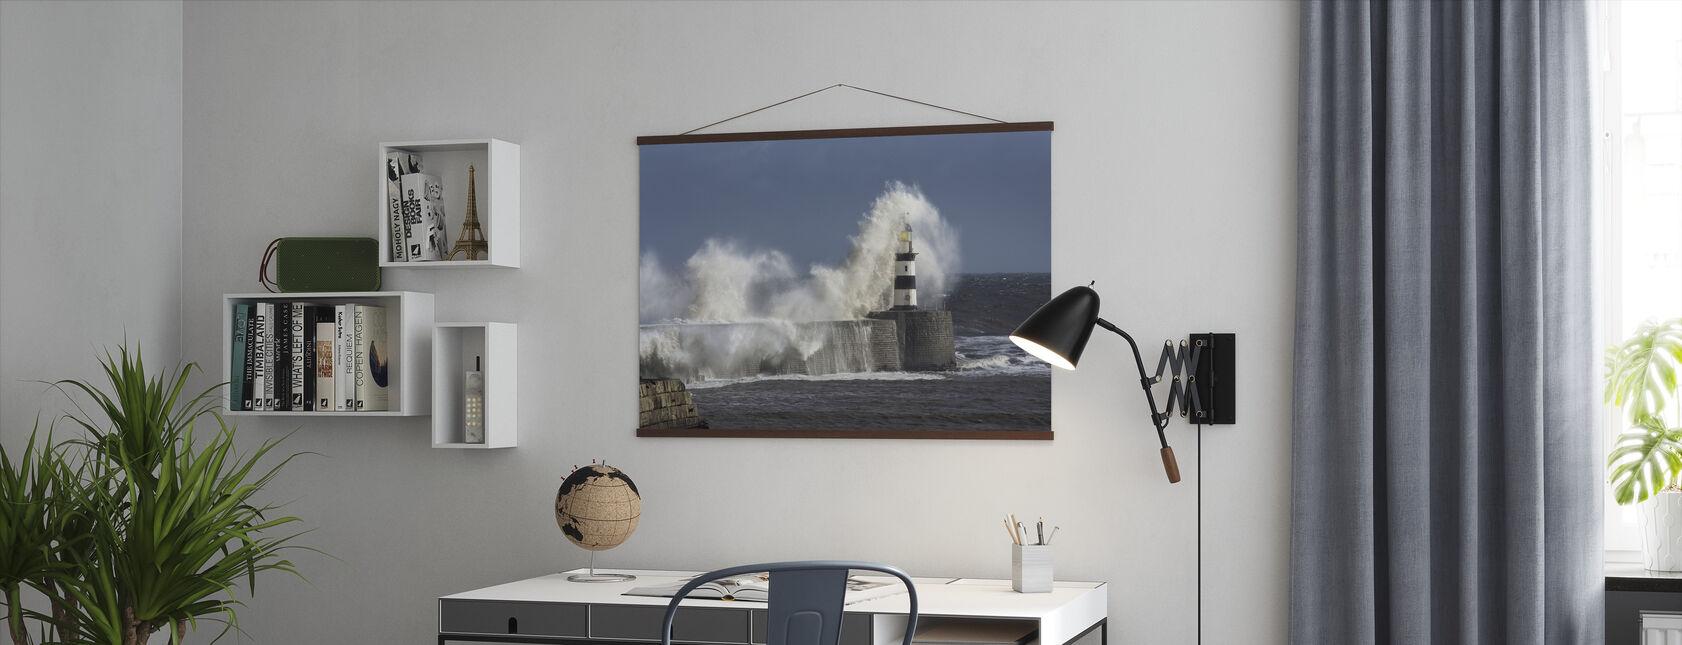 Rough Sea vid Seaham fyr i England - Poster - Kontor